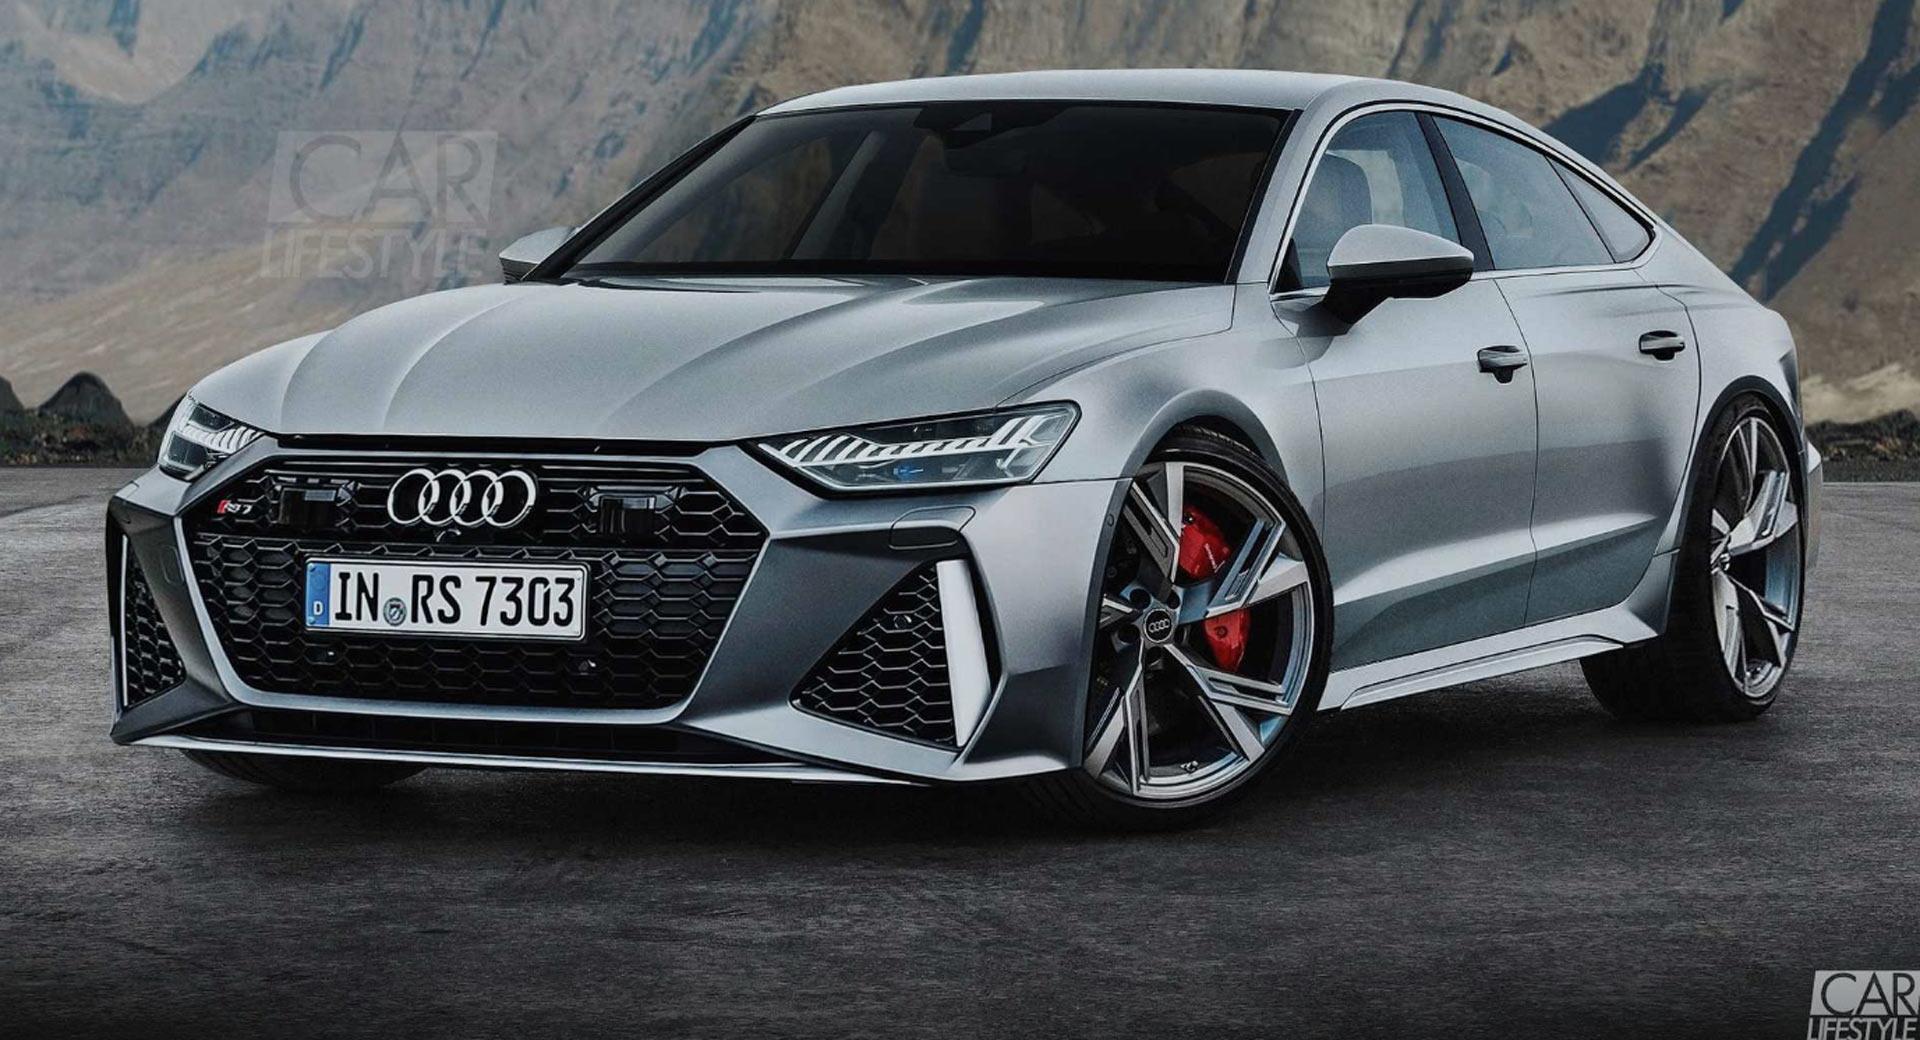 Audi Confirms New RS7 Sportback For Frankfurt Motor Show